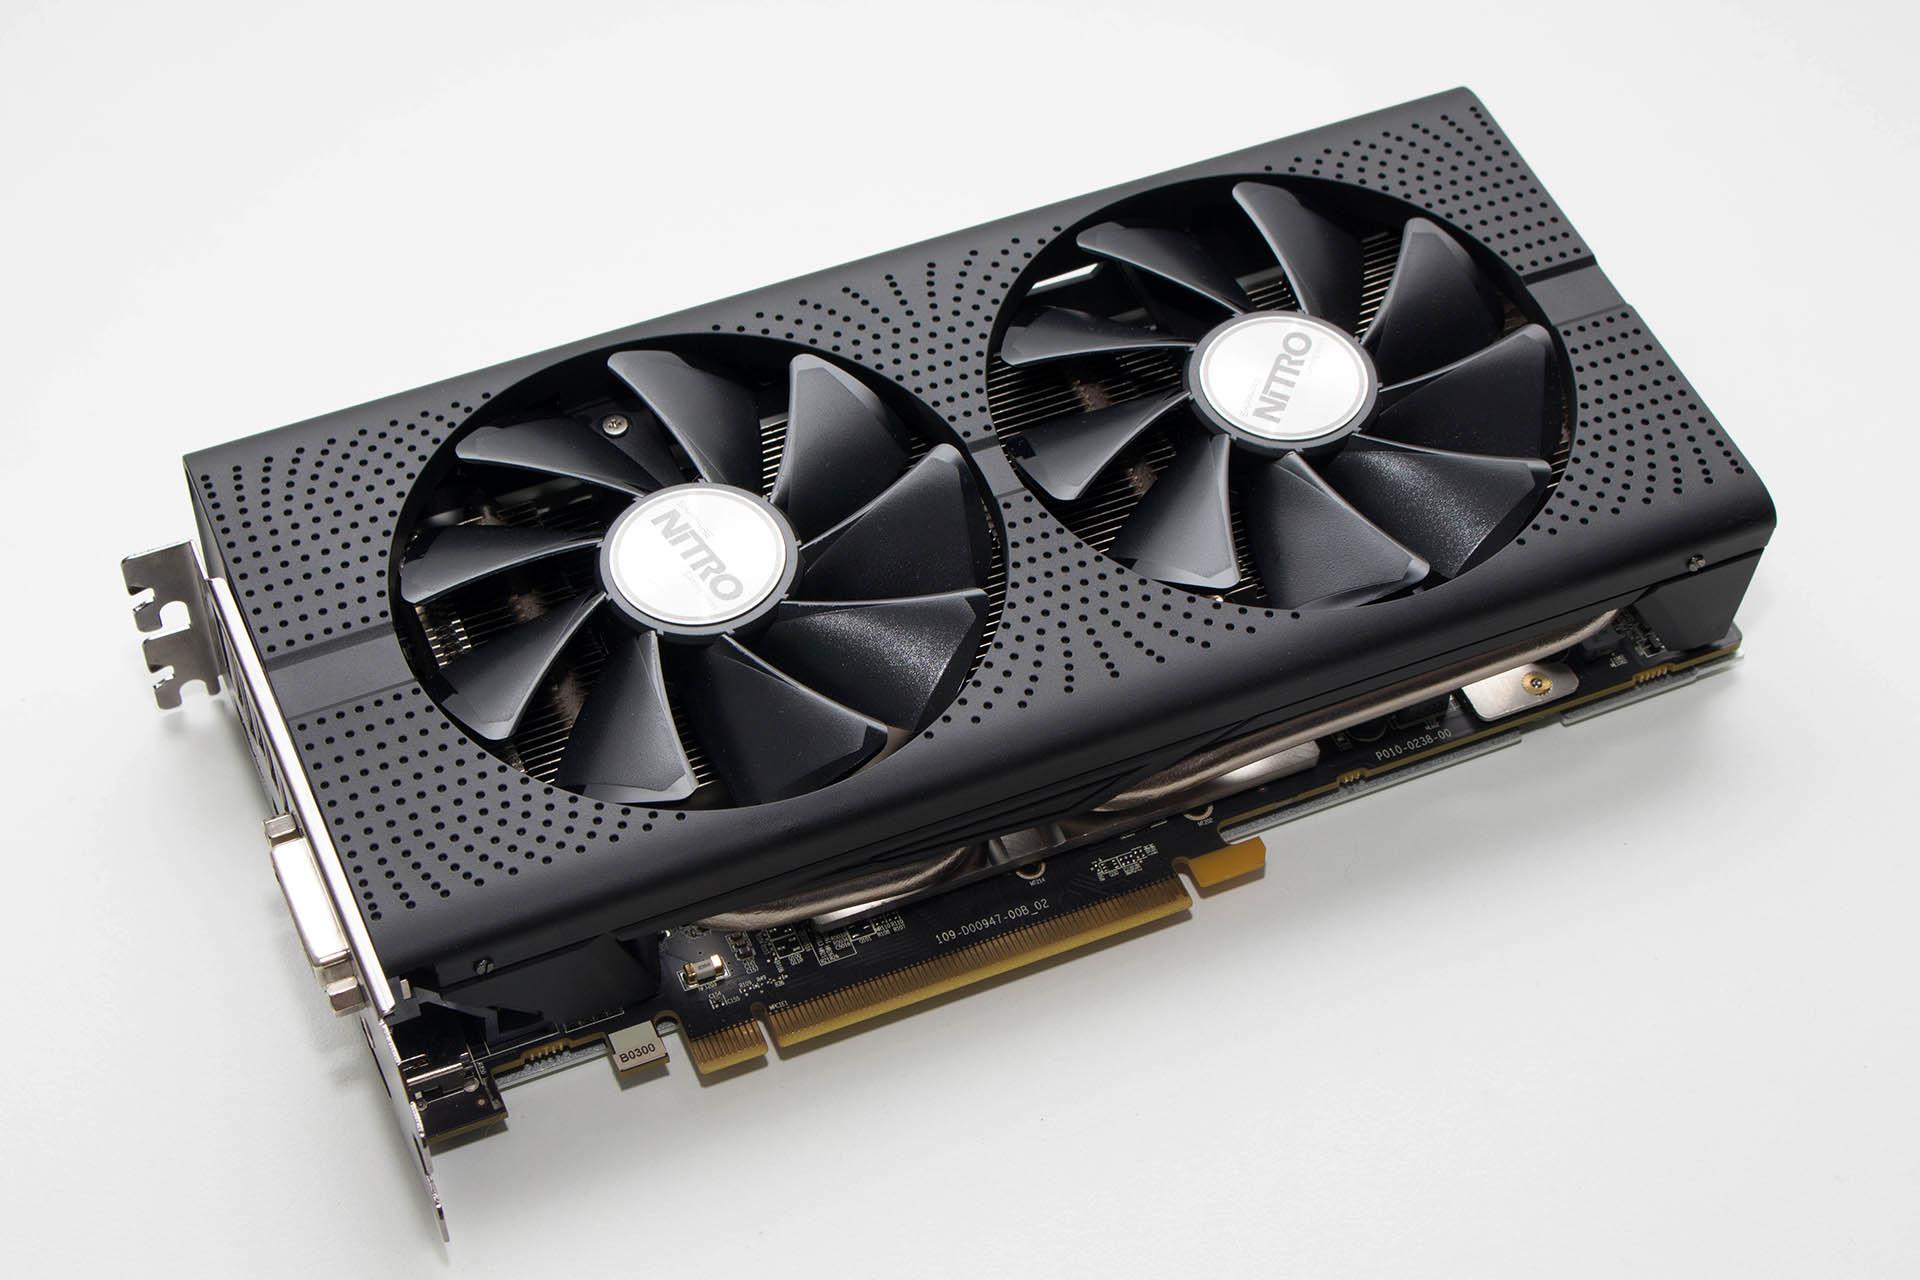 Sapphire Radeon RX480 Nitro+ 4GB test